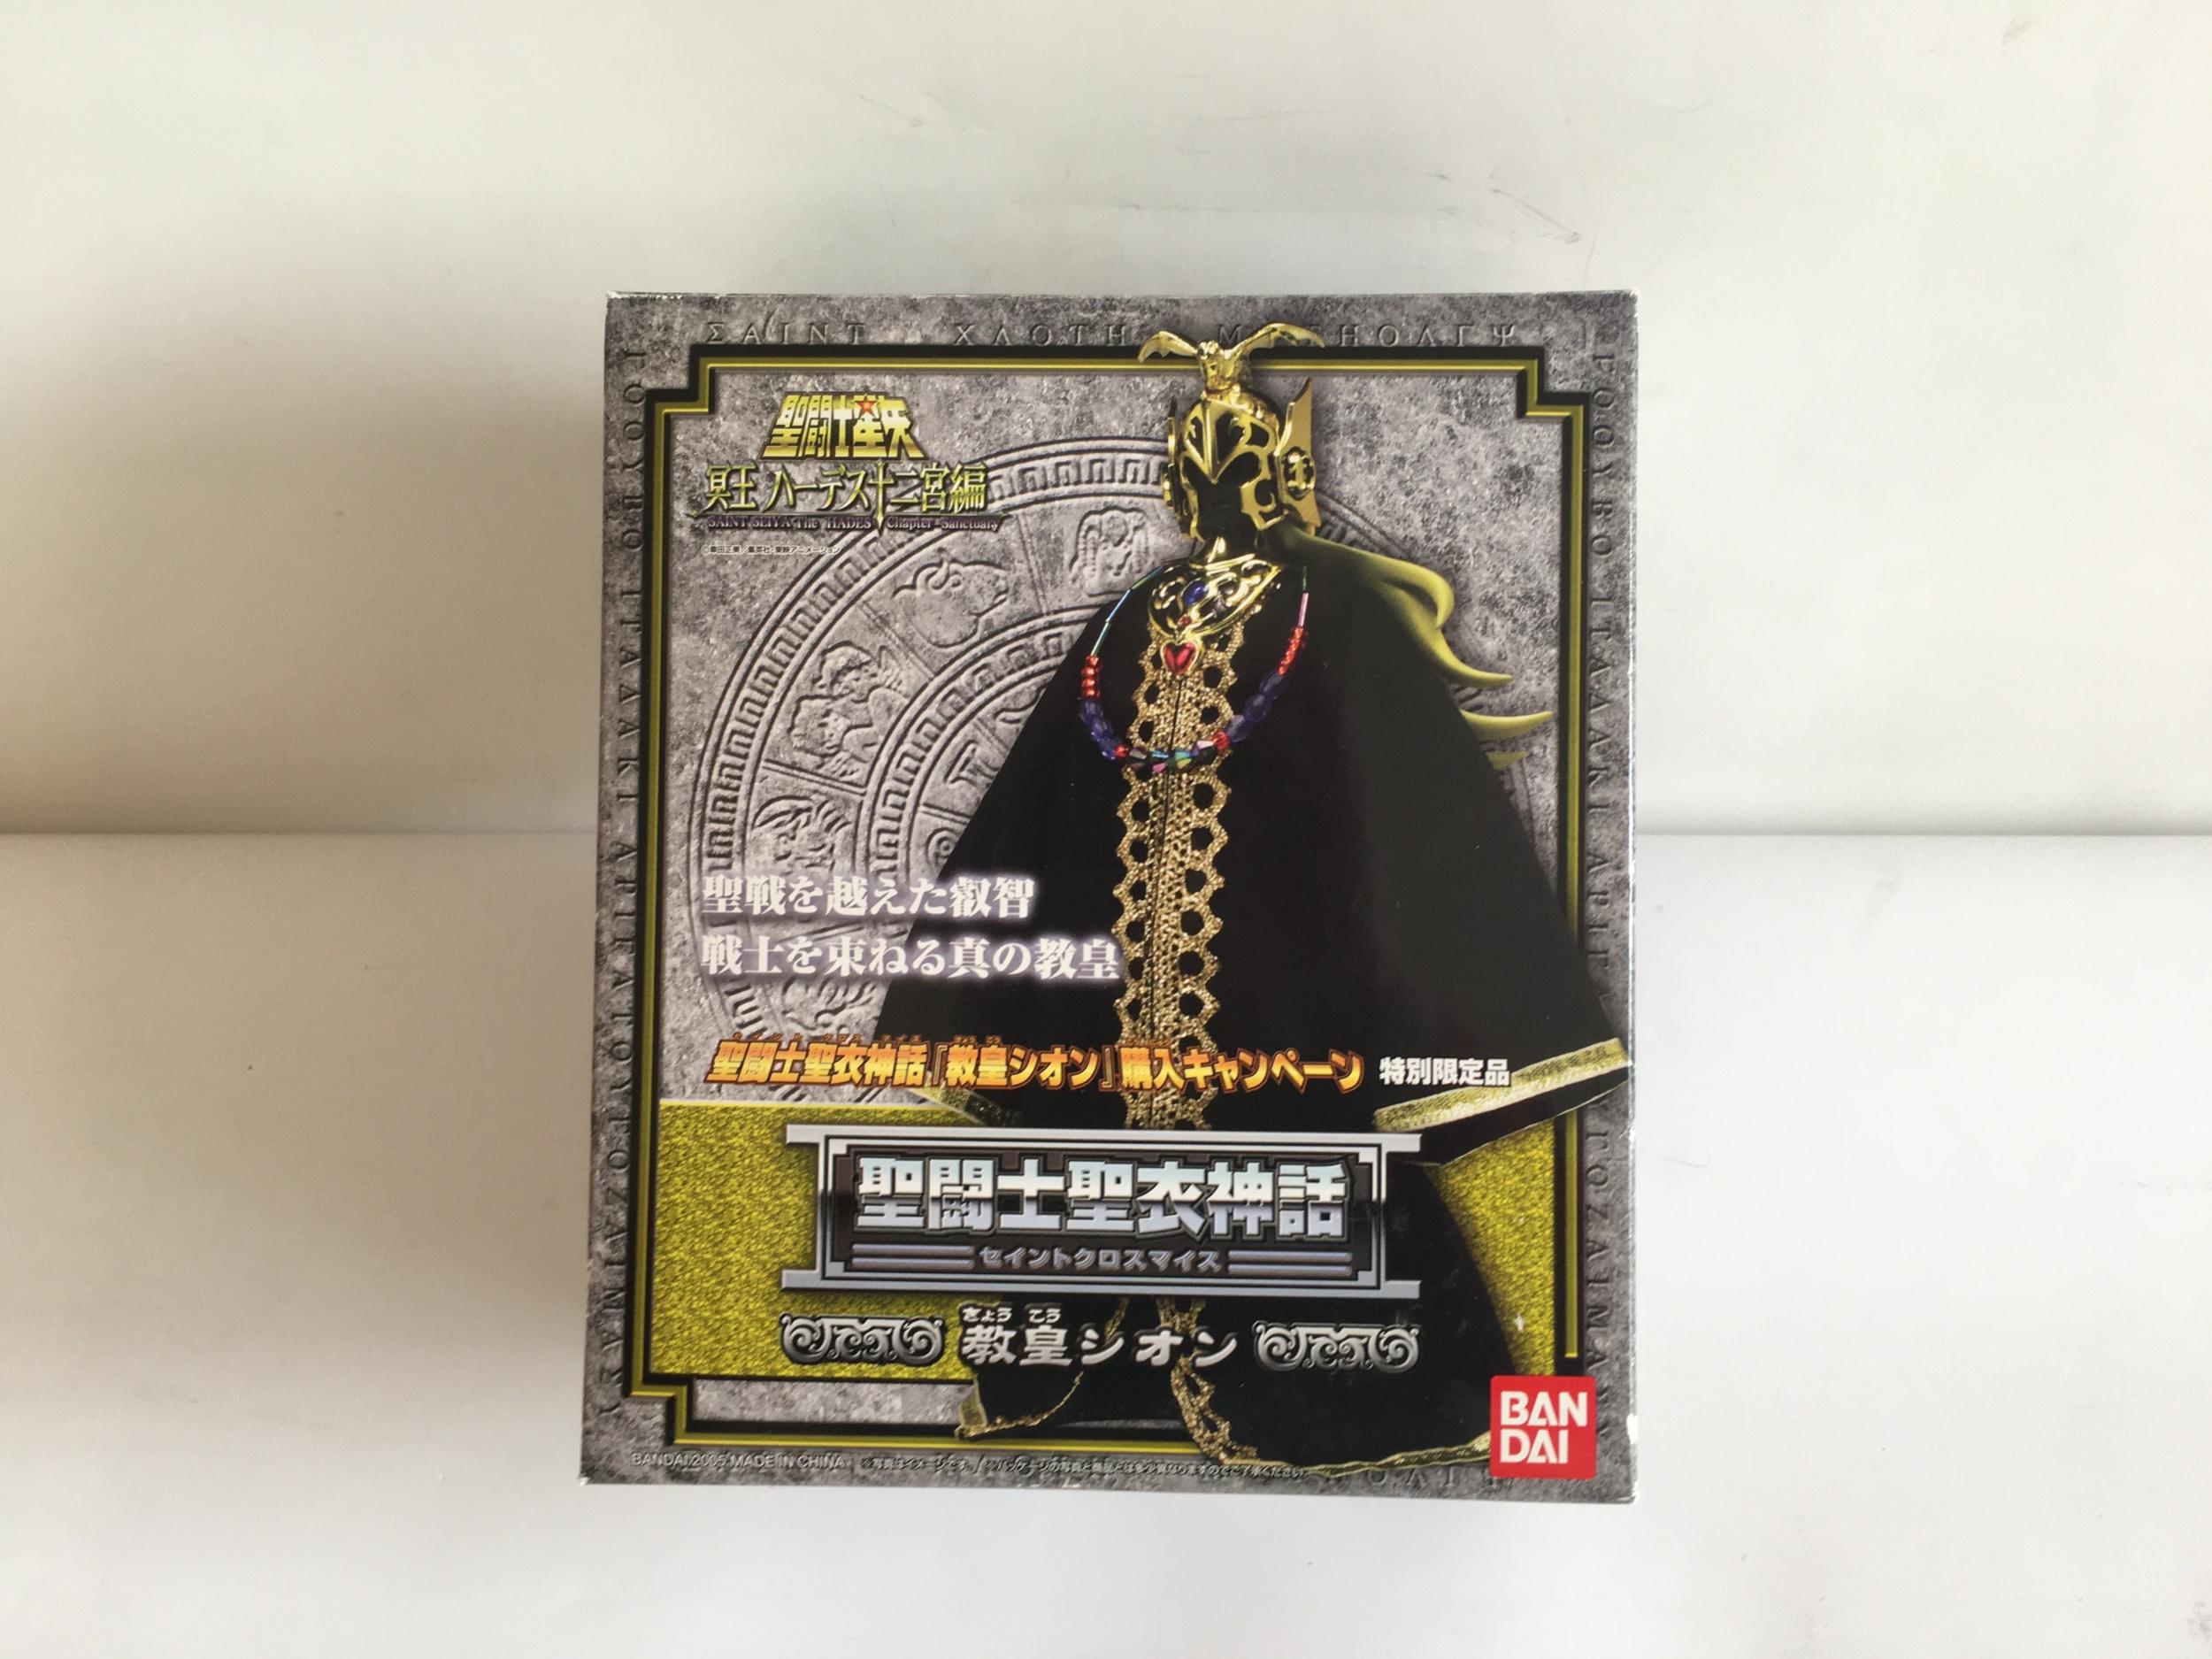 Bandai – Myth Cloth Grande Pope Bandai